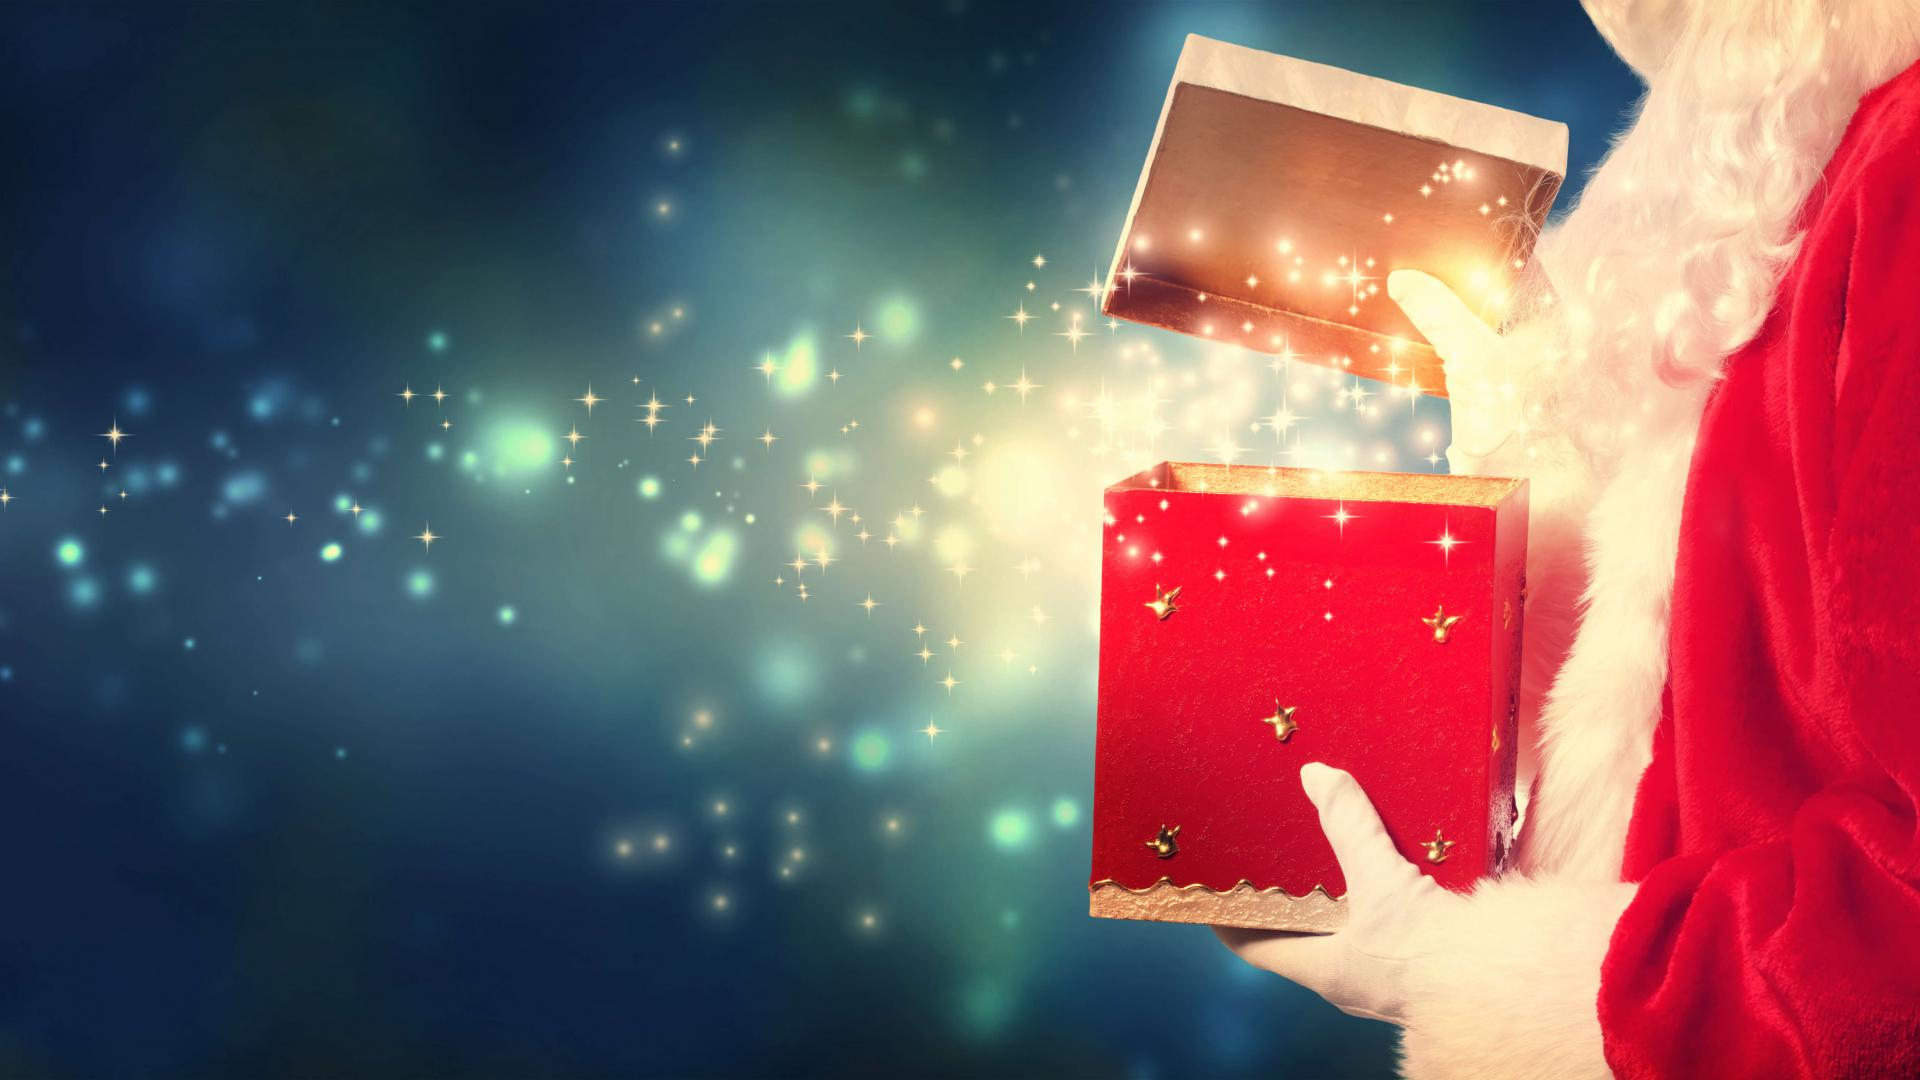 Songs to Invoke Christmas